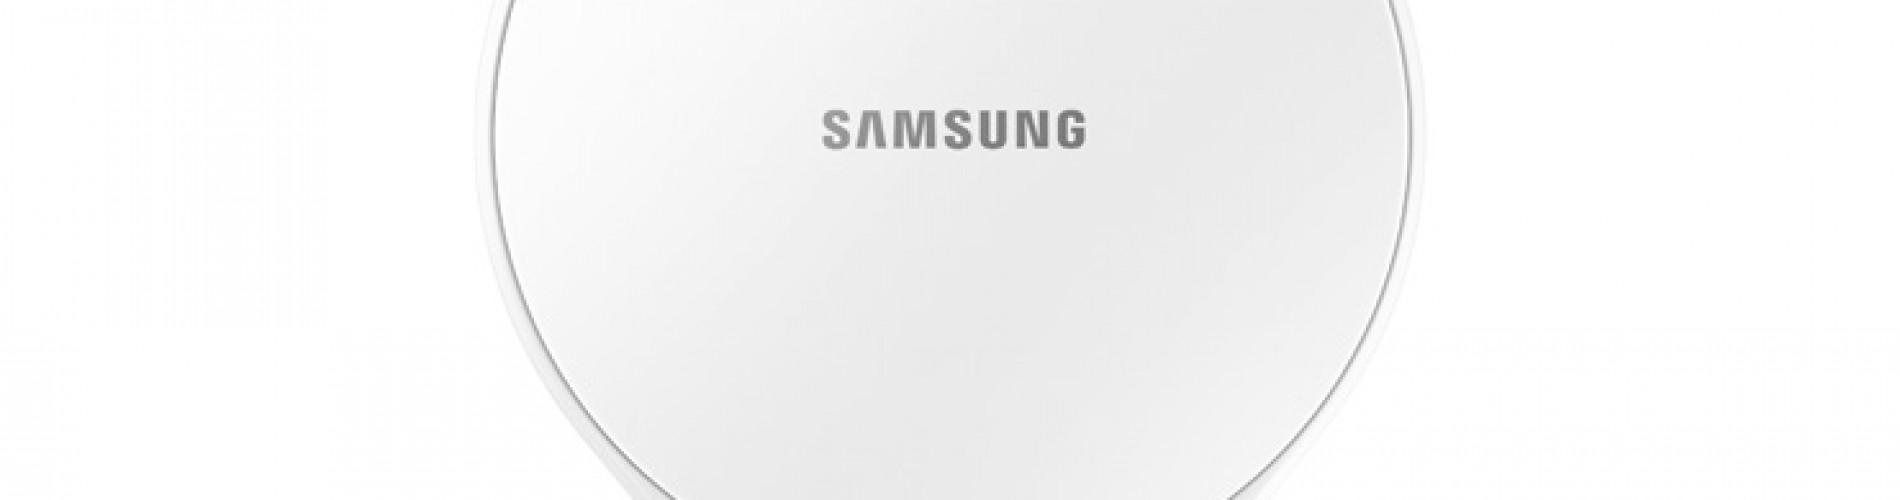 Samsung announces SLEEPsense, a device to monitor sleep and control home appliances